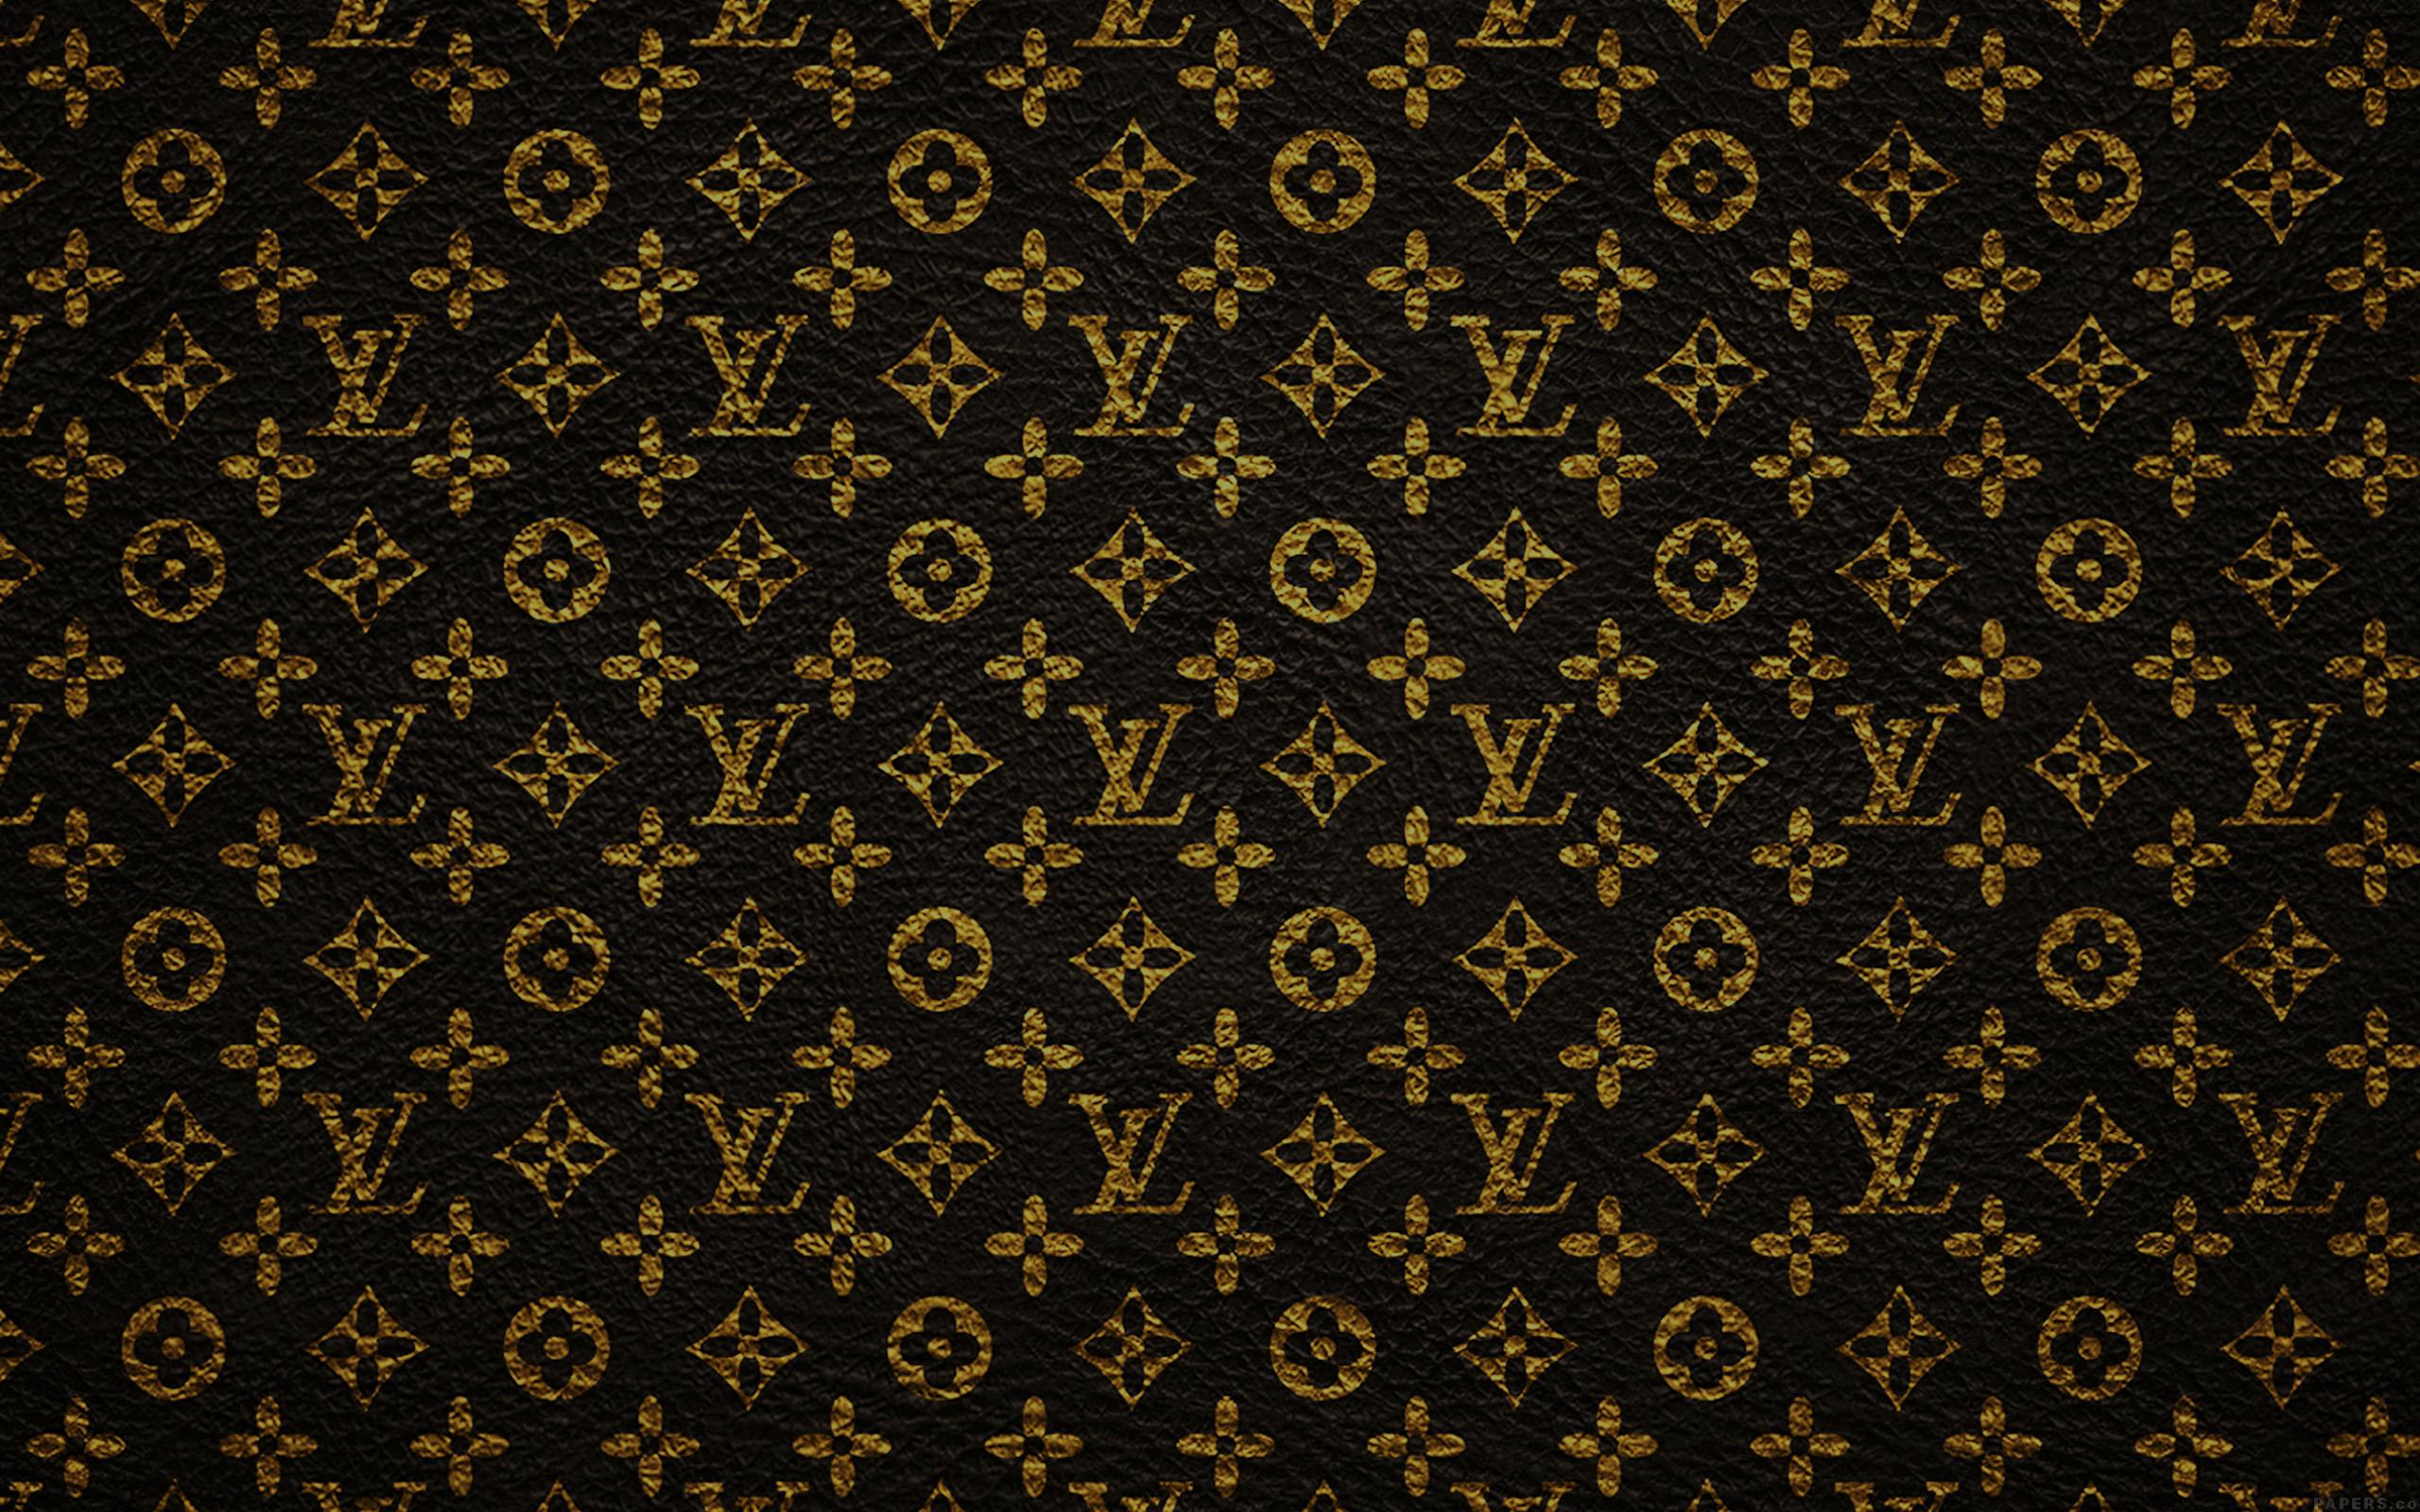 Vf22 Louis Vuitton Dark Pattern Art Papers Co